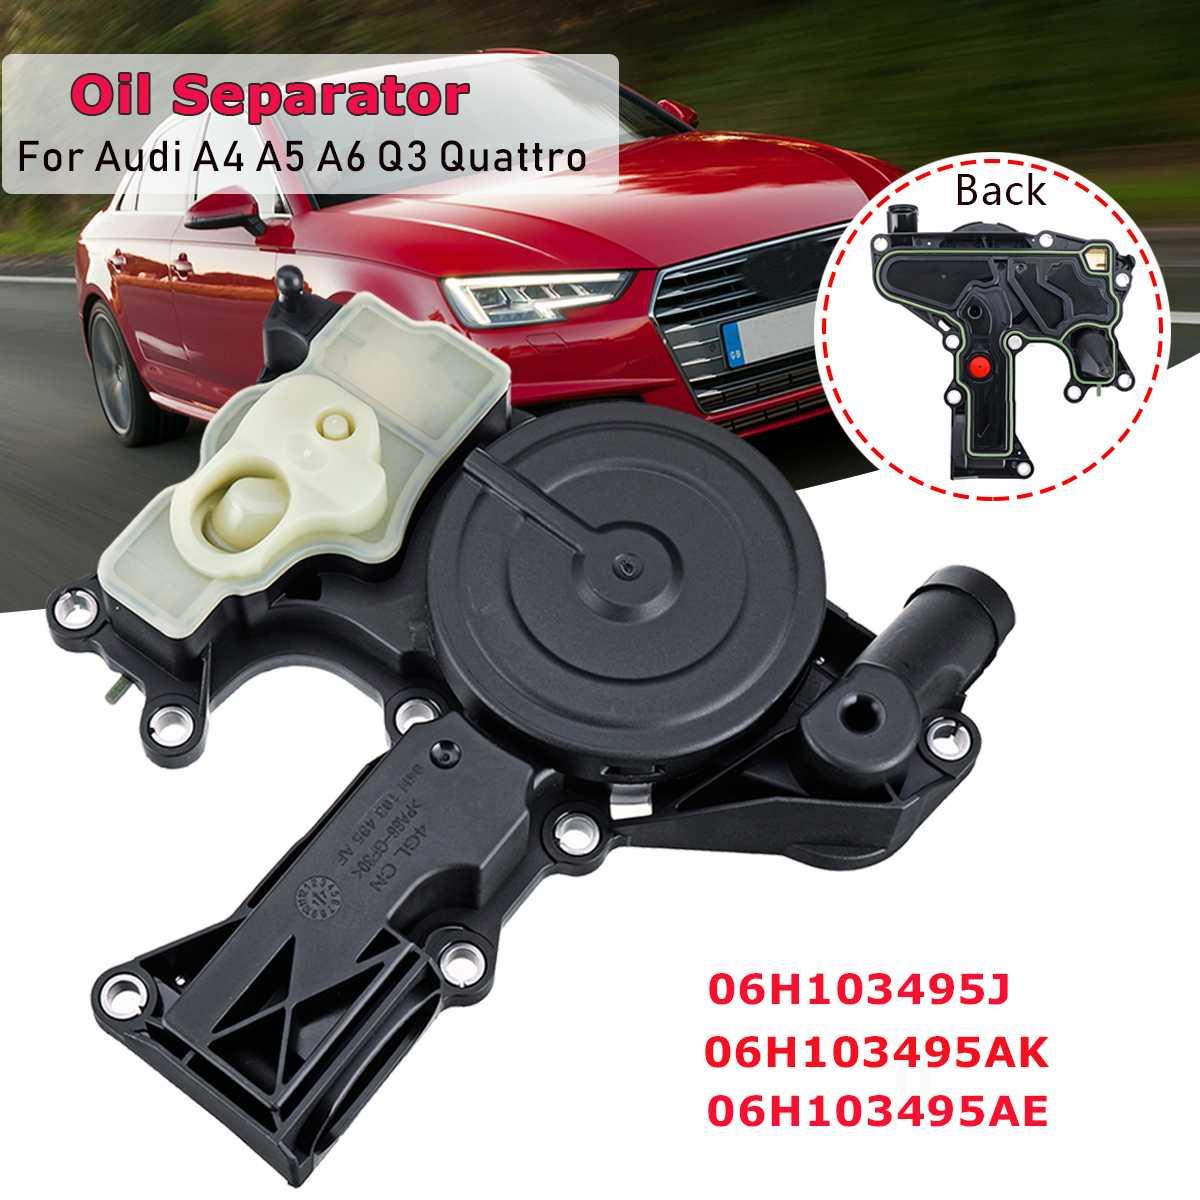 Oil Separator PCV Valve For Audi A4 A6 Q3 Q5 Quattro 06H103495AE 06H103495J US